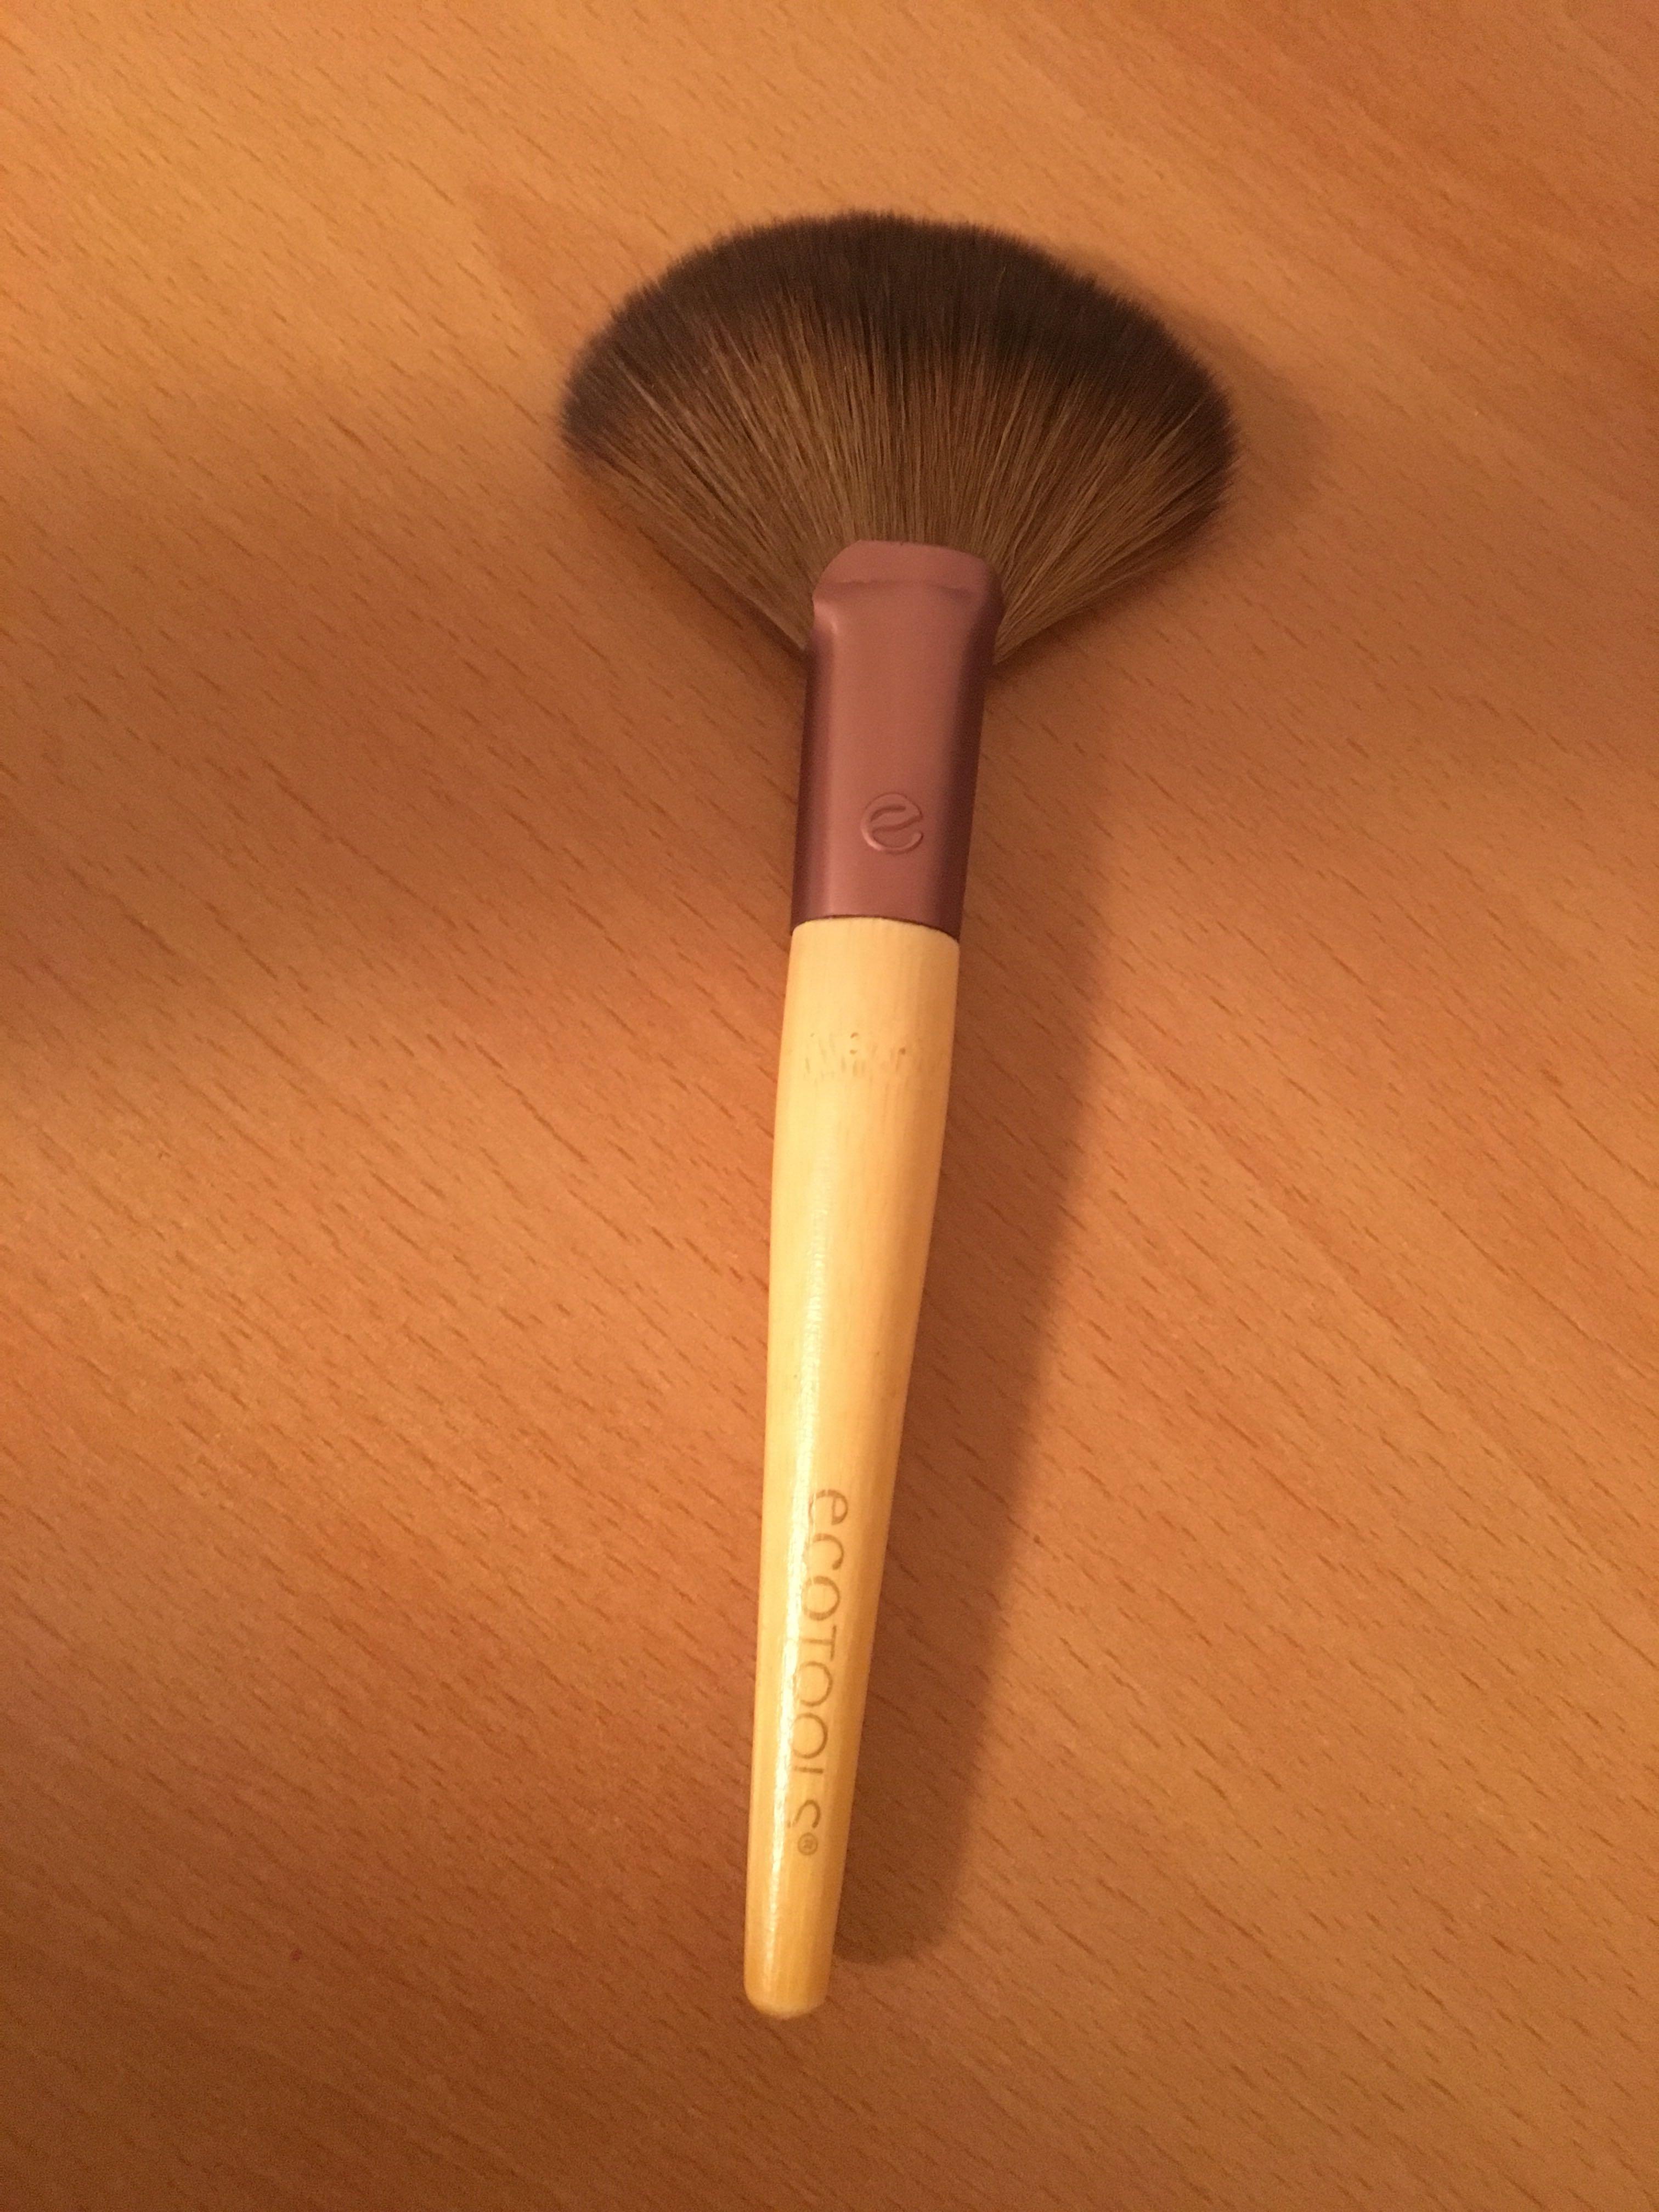 Eco Tools Fan Brush